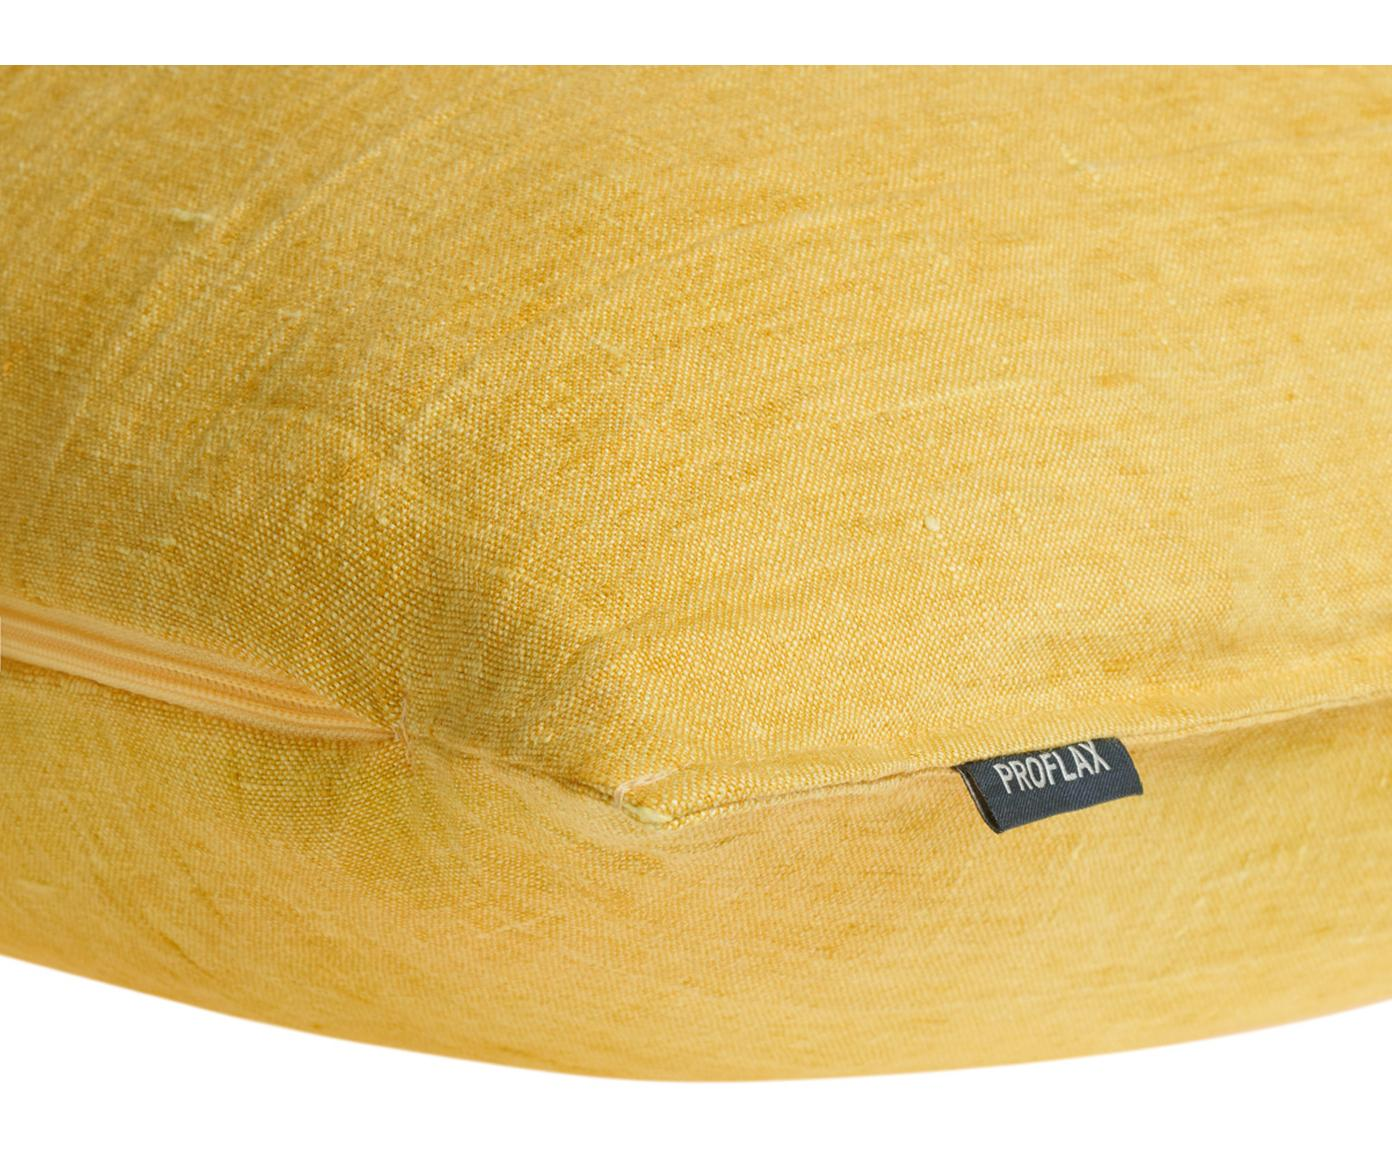 Poszewka na poduszkę z lnu Sven, Len, Brunatnożółty, S 60 x D 60 cm